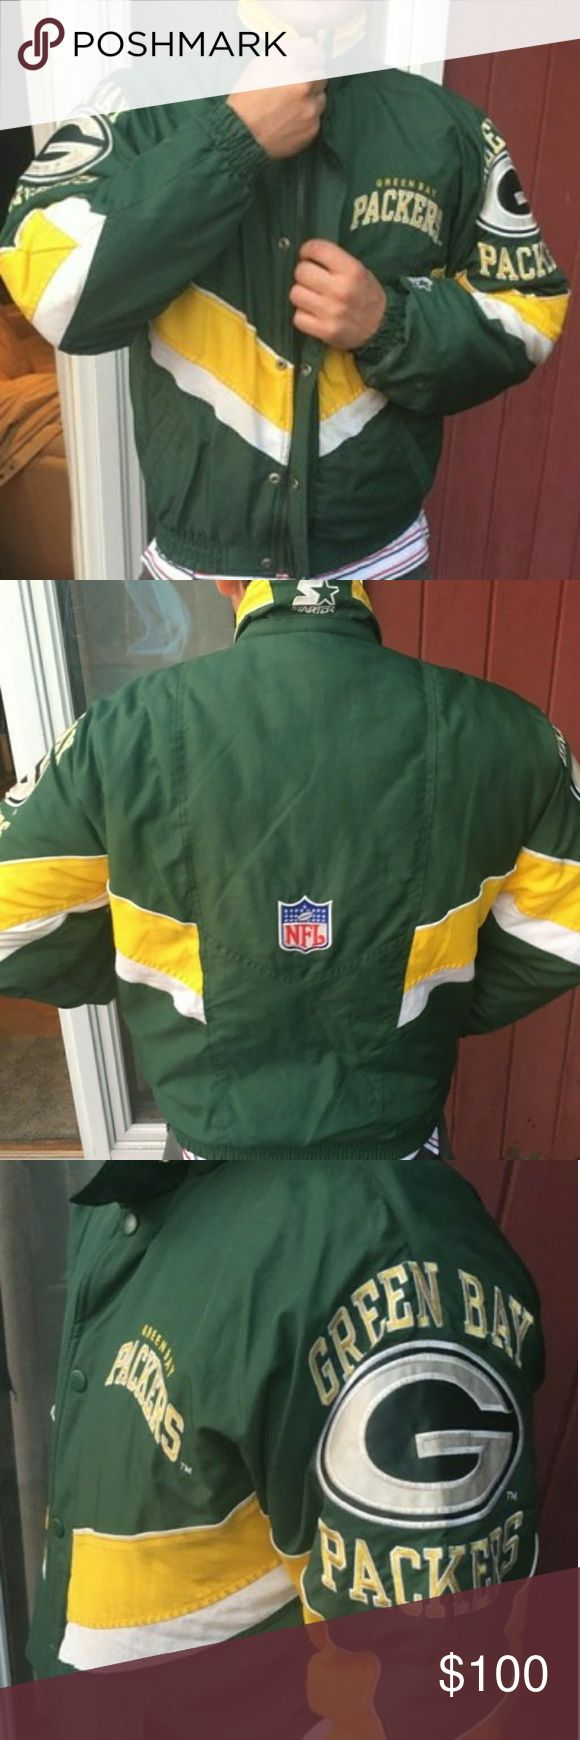 Starter Mens Green Bay Packers Football Jacket VINTAGE GREEN BAY PACKERS JACKET  New Without Tags  Mens Size Small Starter Jackets & Coats